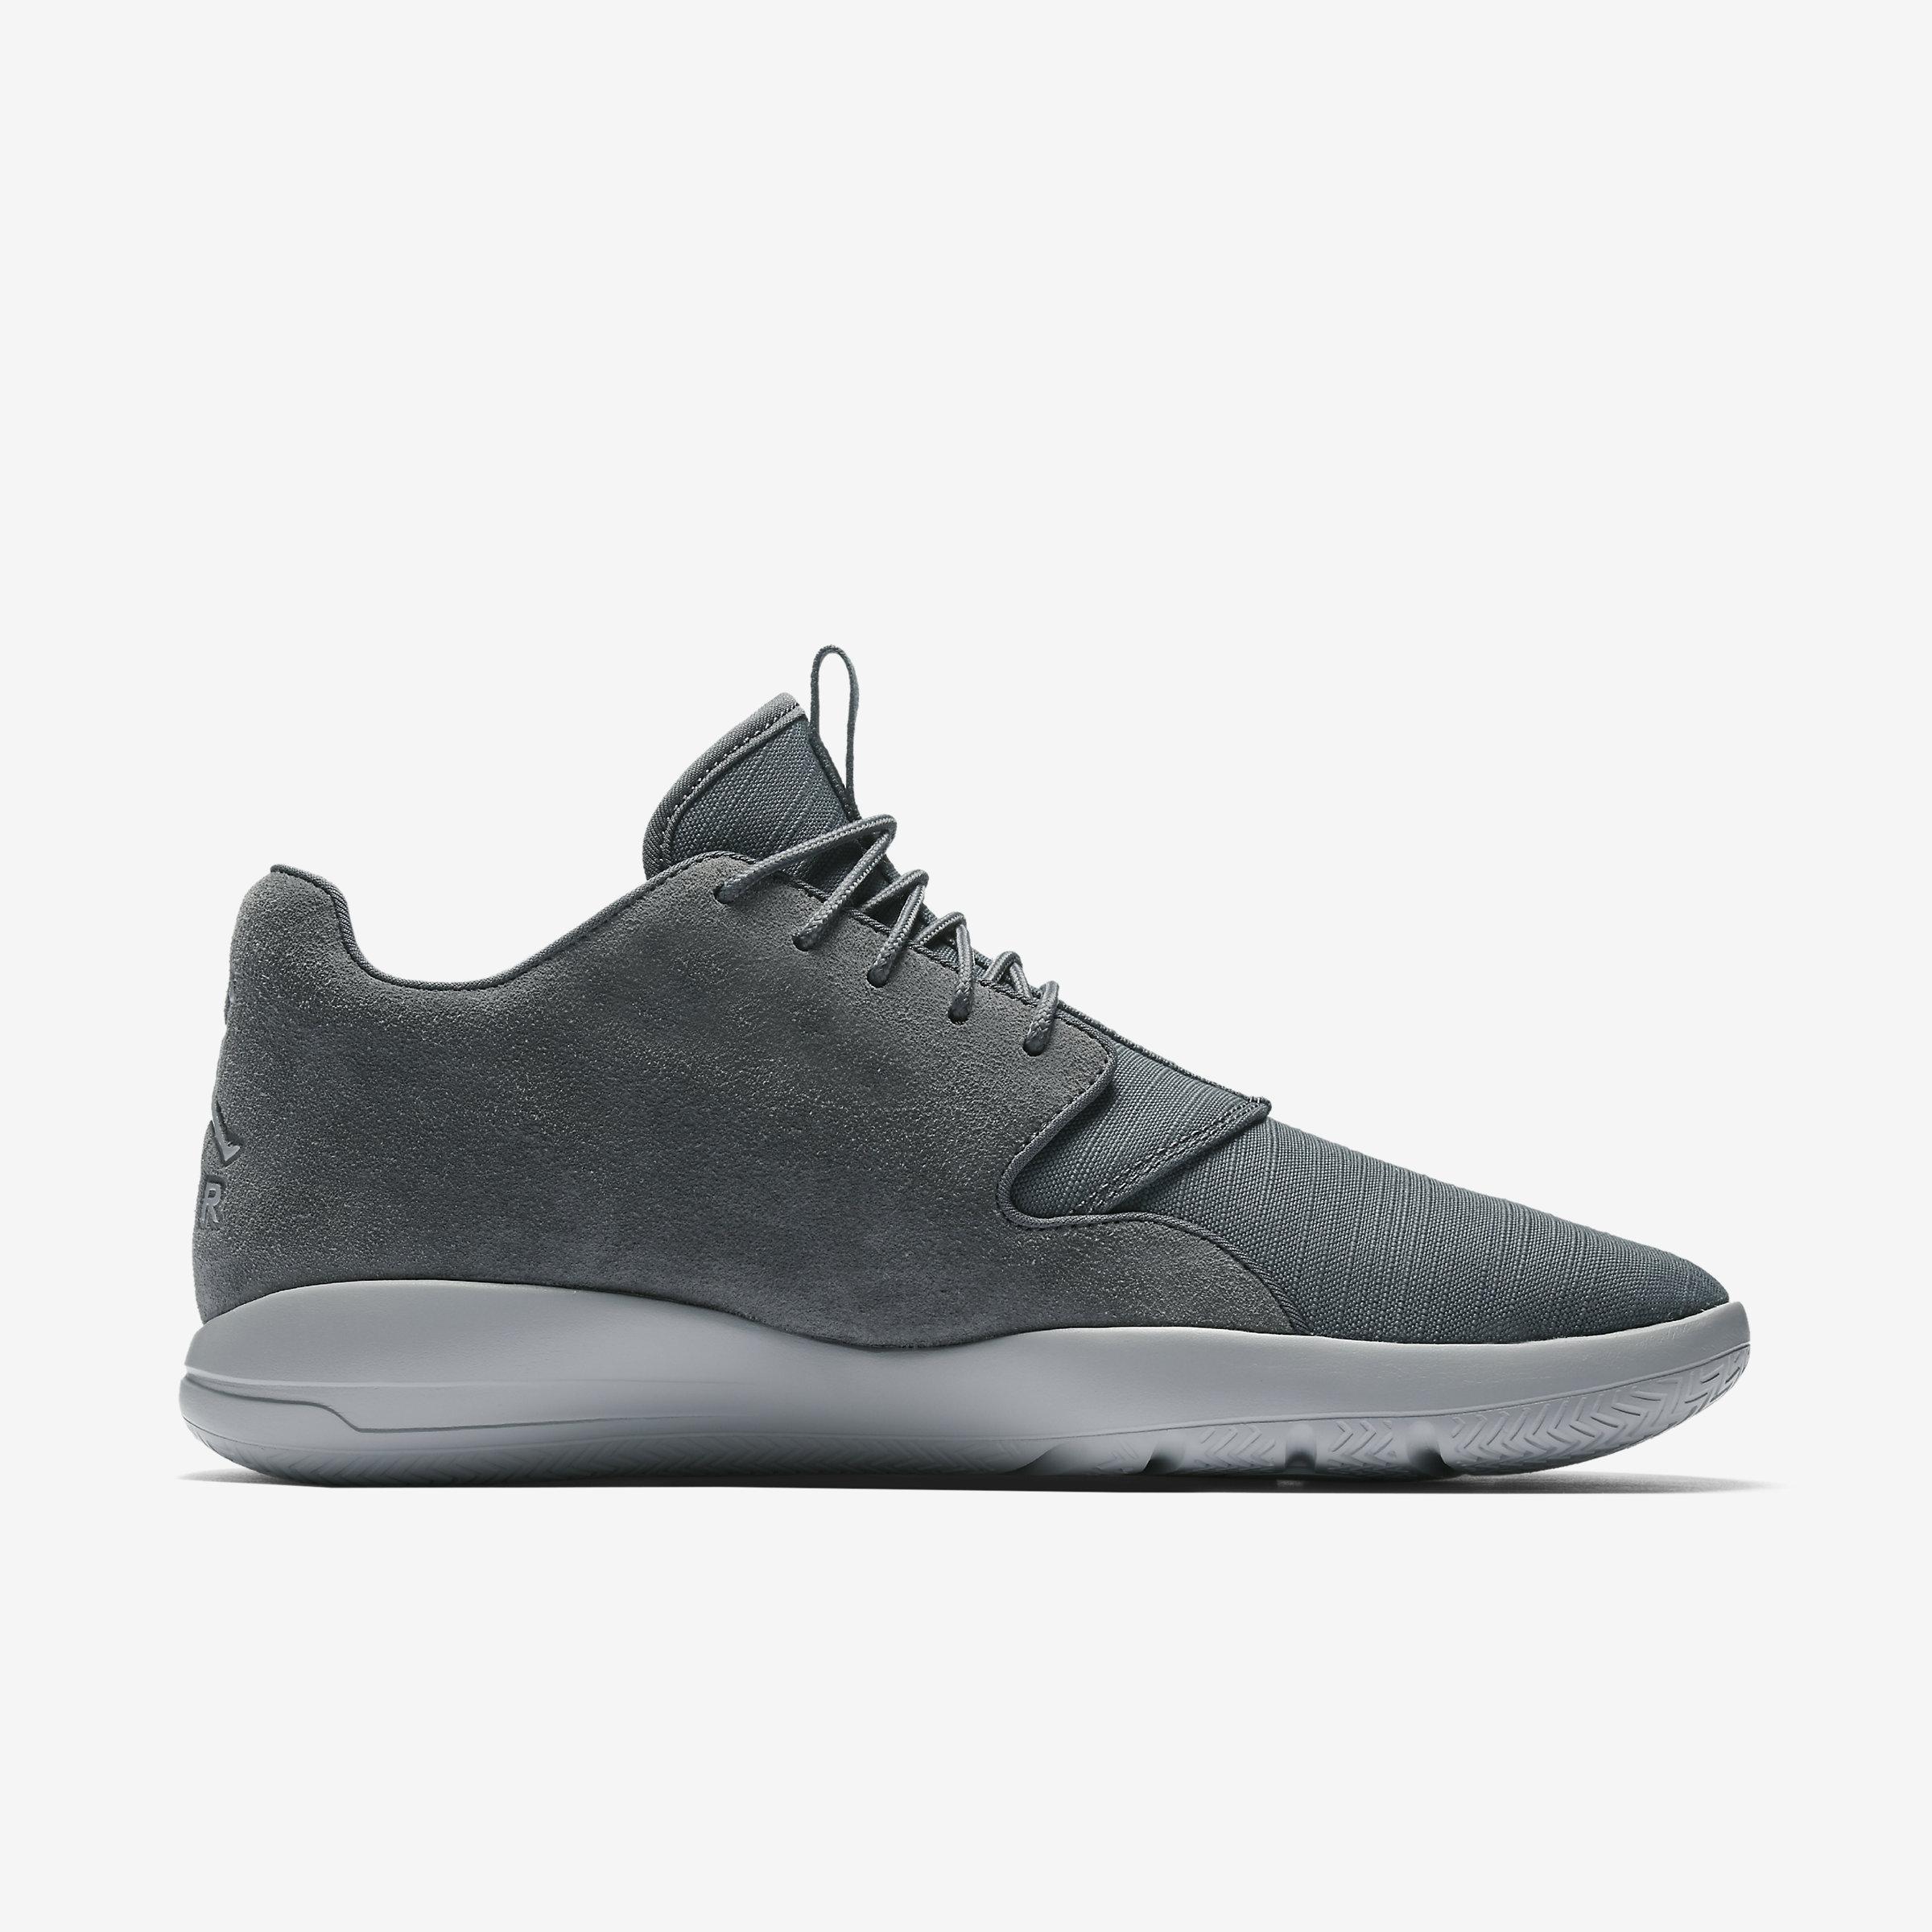 Nike Jordan Eclipse Leather in Grey for Men